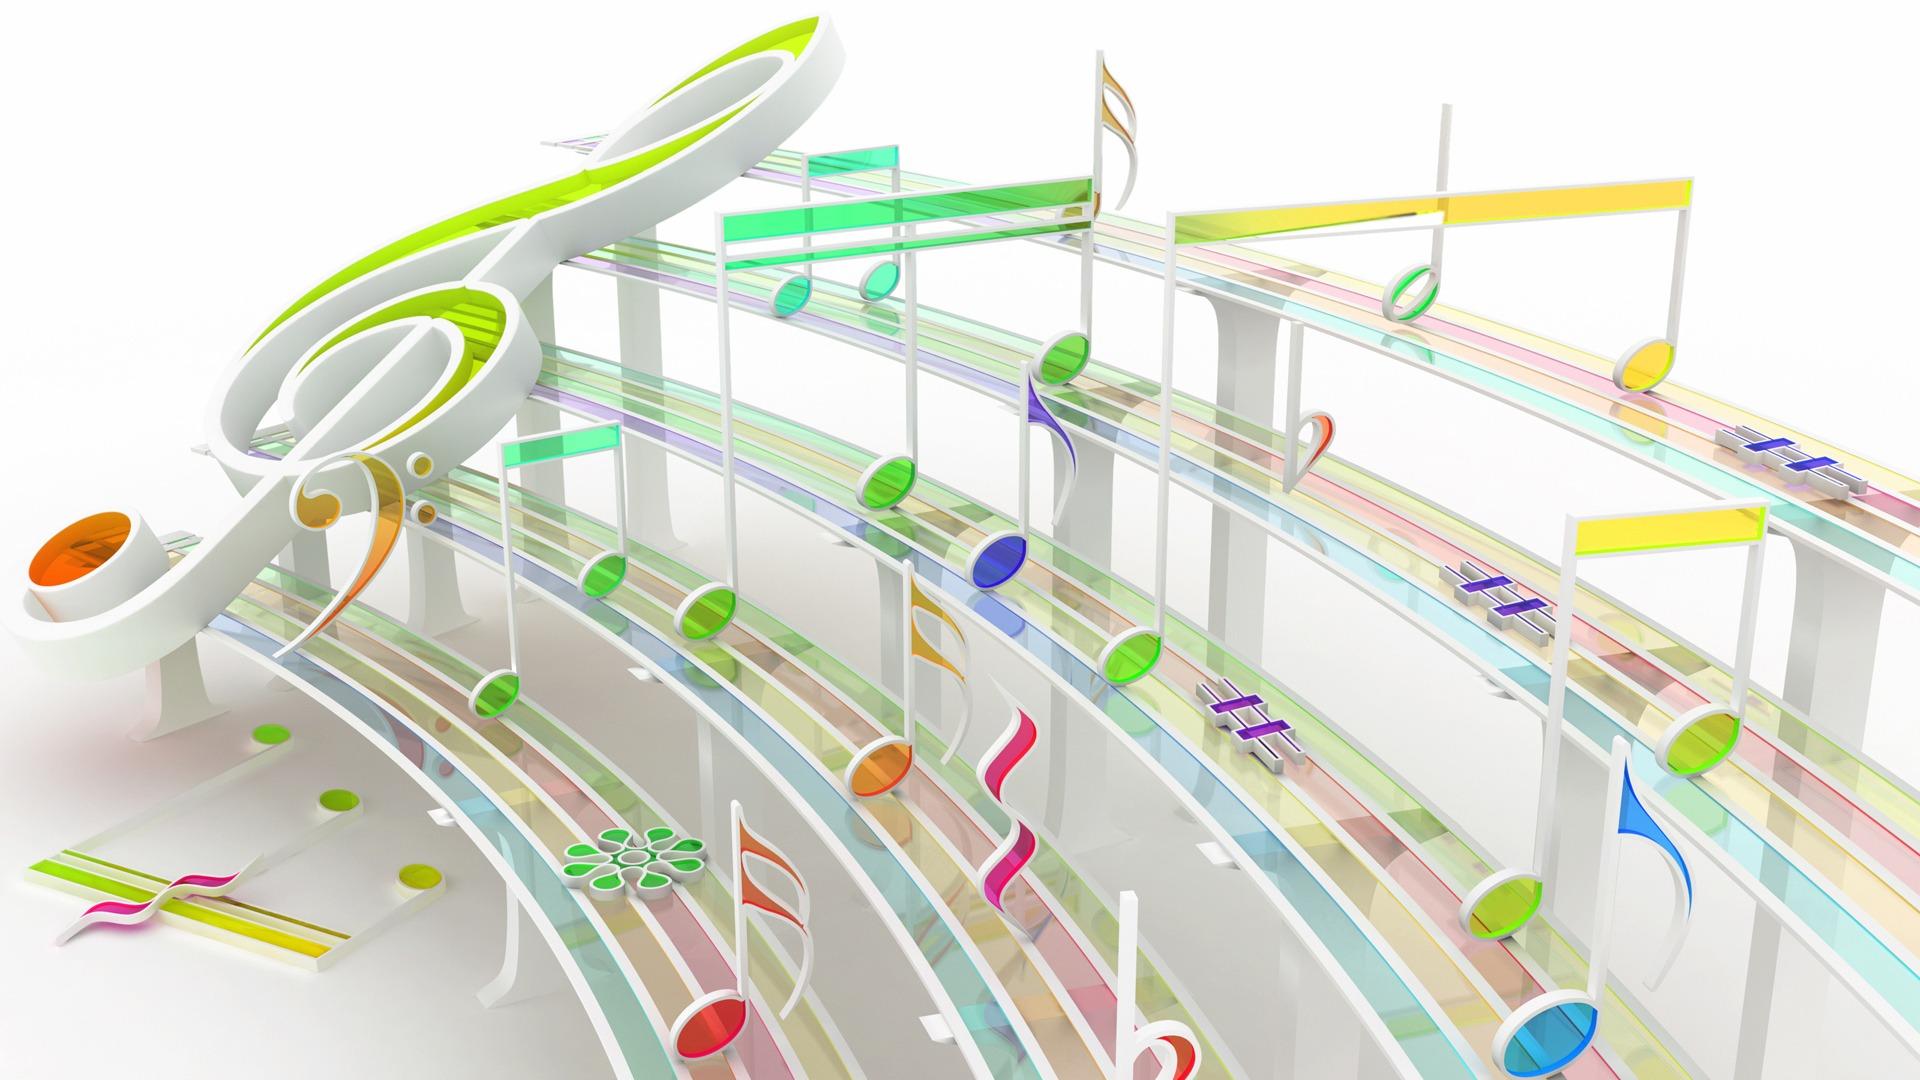 Rhythmics Wallpaper 3D Models Wallpapers